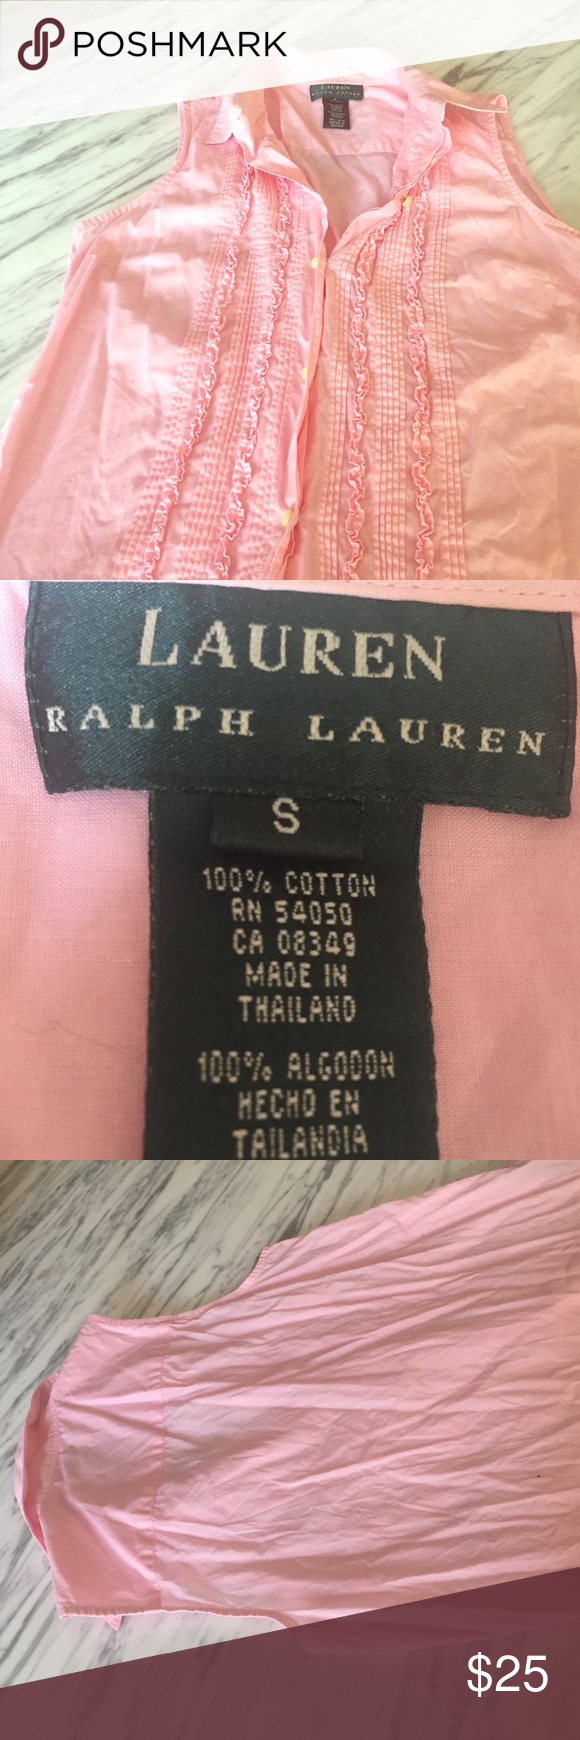 🌷Lauren by Ralph Lauren pink sleeveless top Lauren by Ralph Lauren pink sleeveless top size small Lauren Ralph Lauren Tops Button Down Shirts